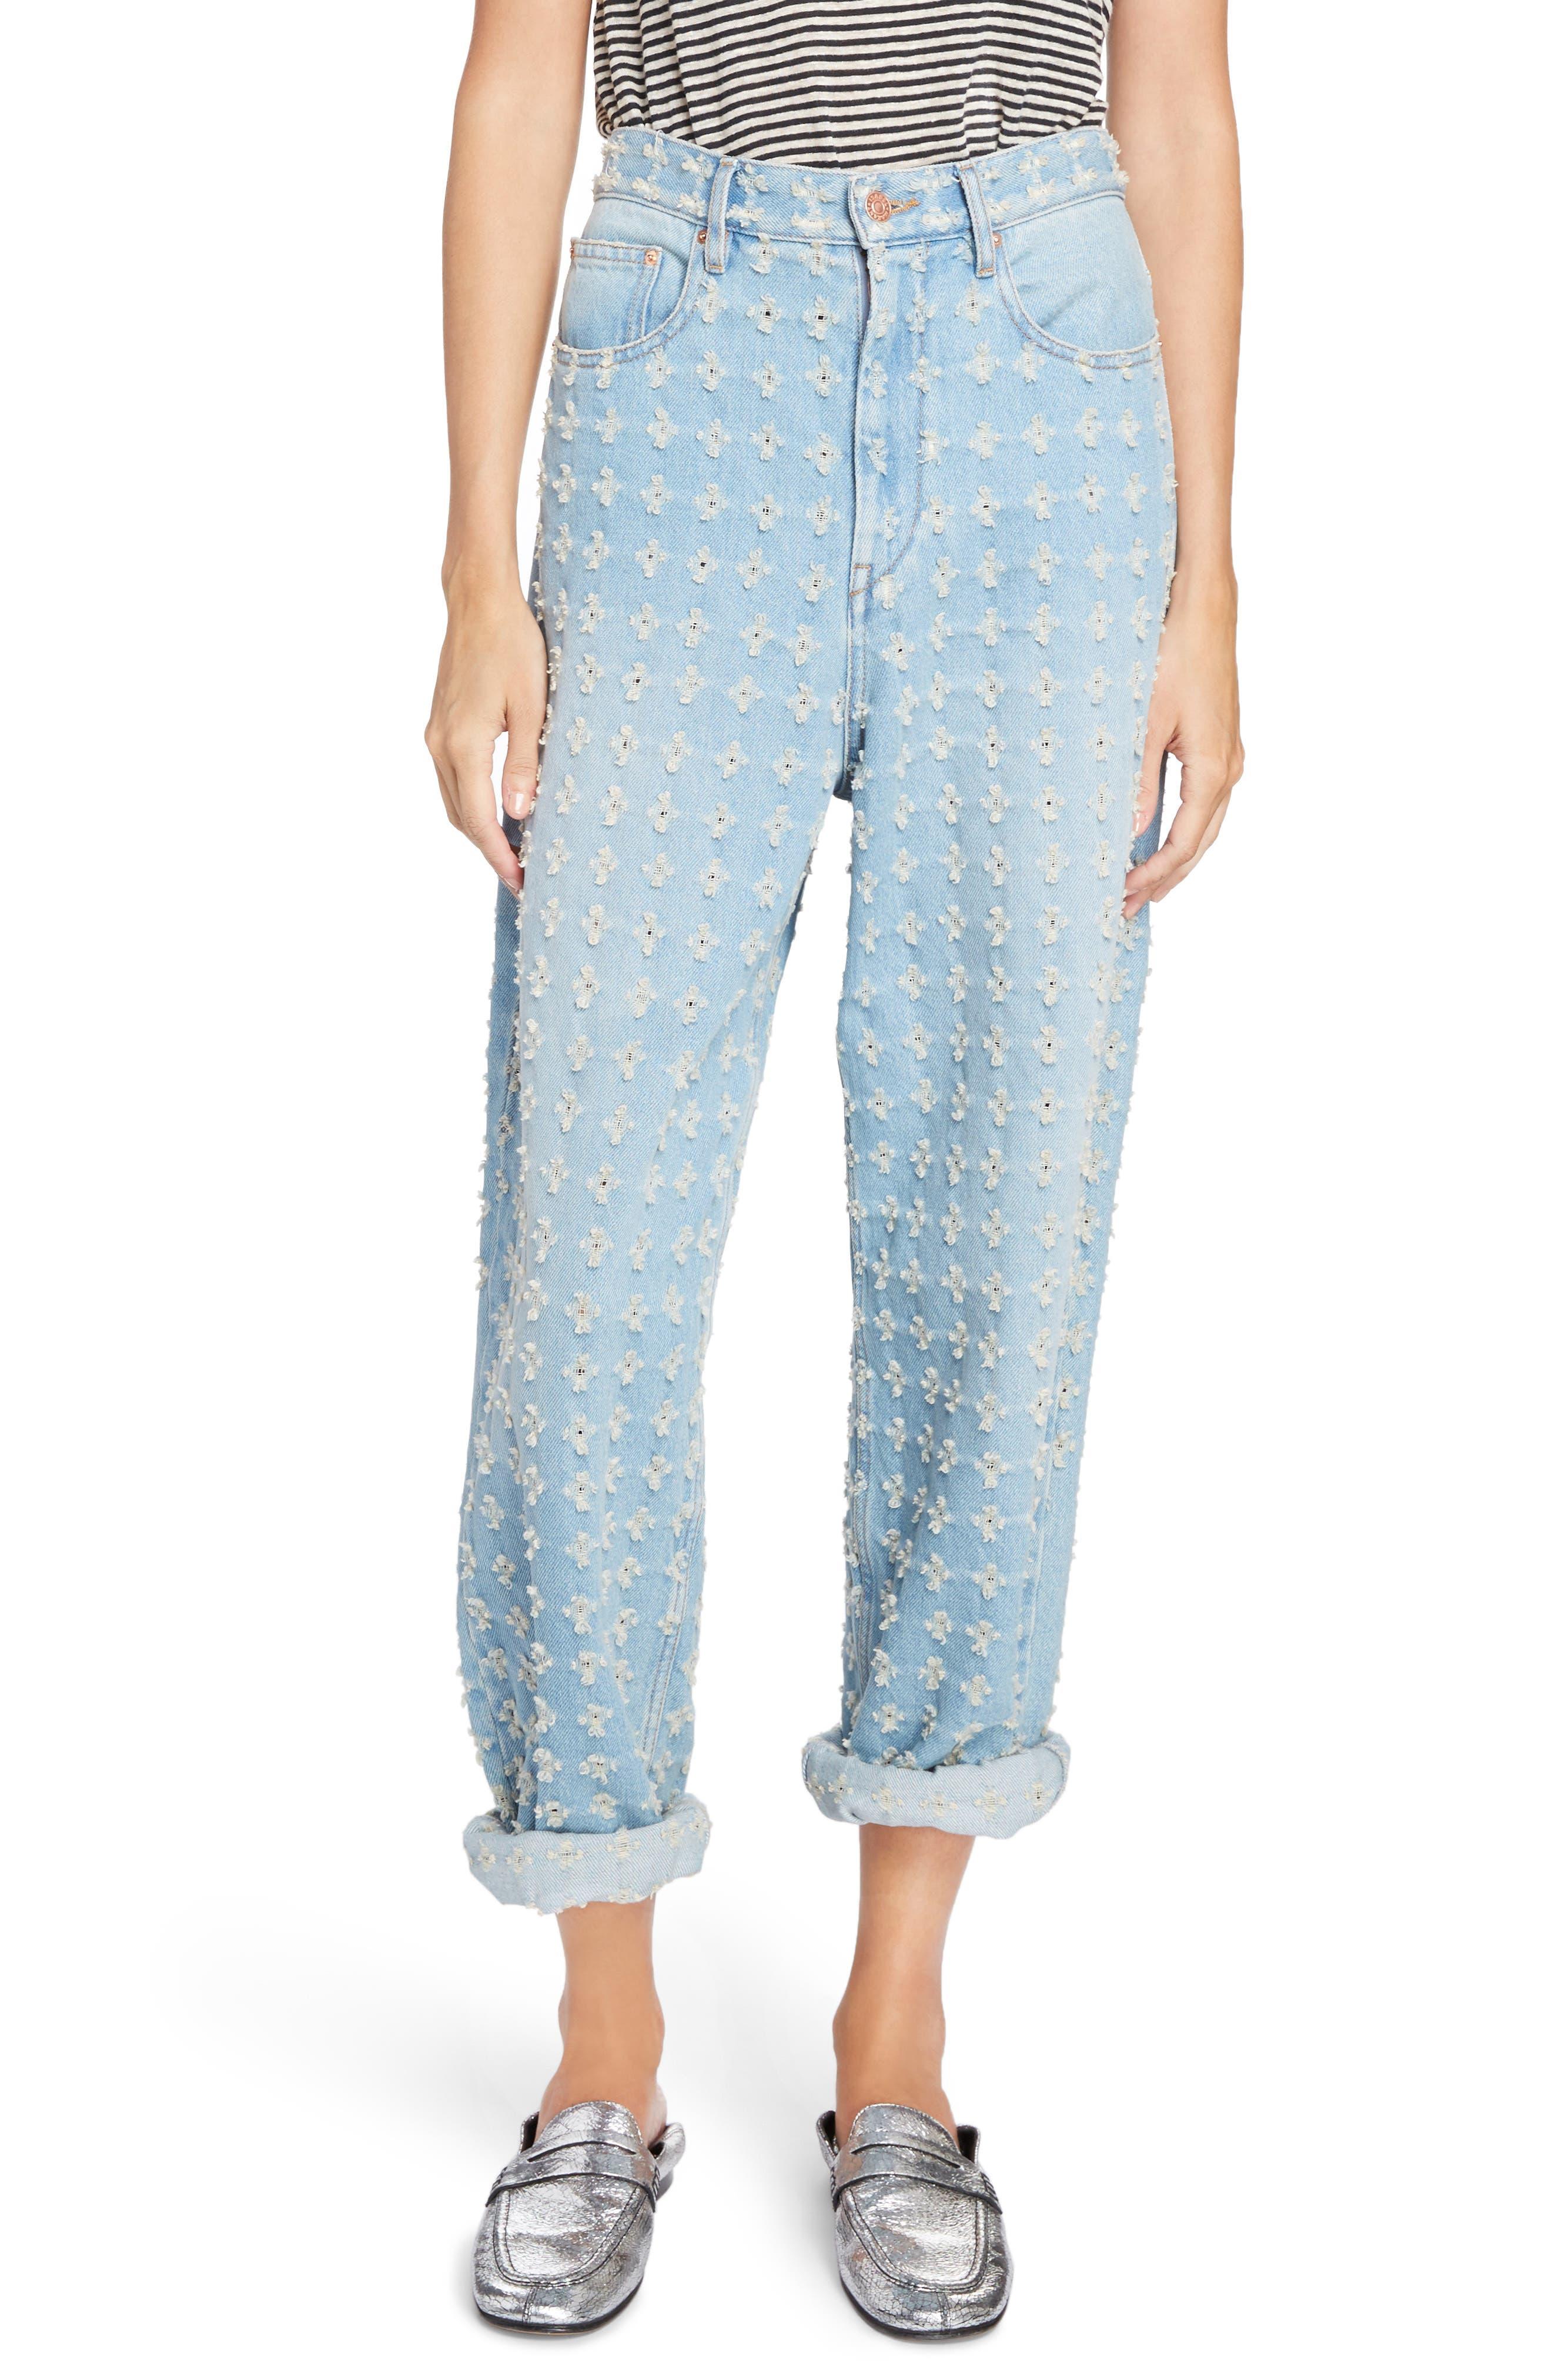 Isabel Marant Étoile Cory Cuffed Jeans,                         Main,                         color, 400